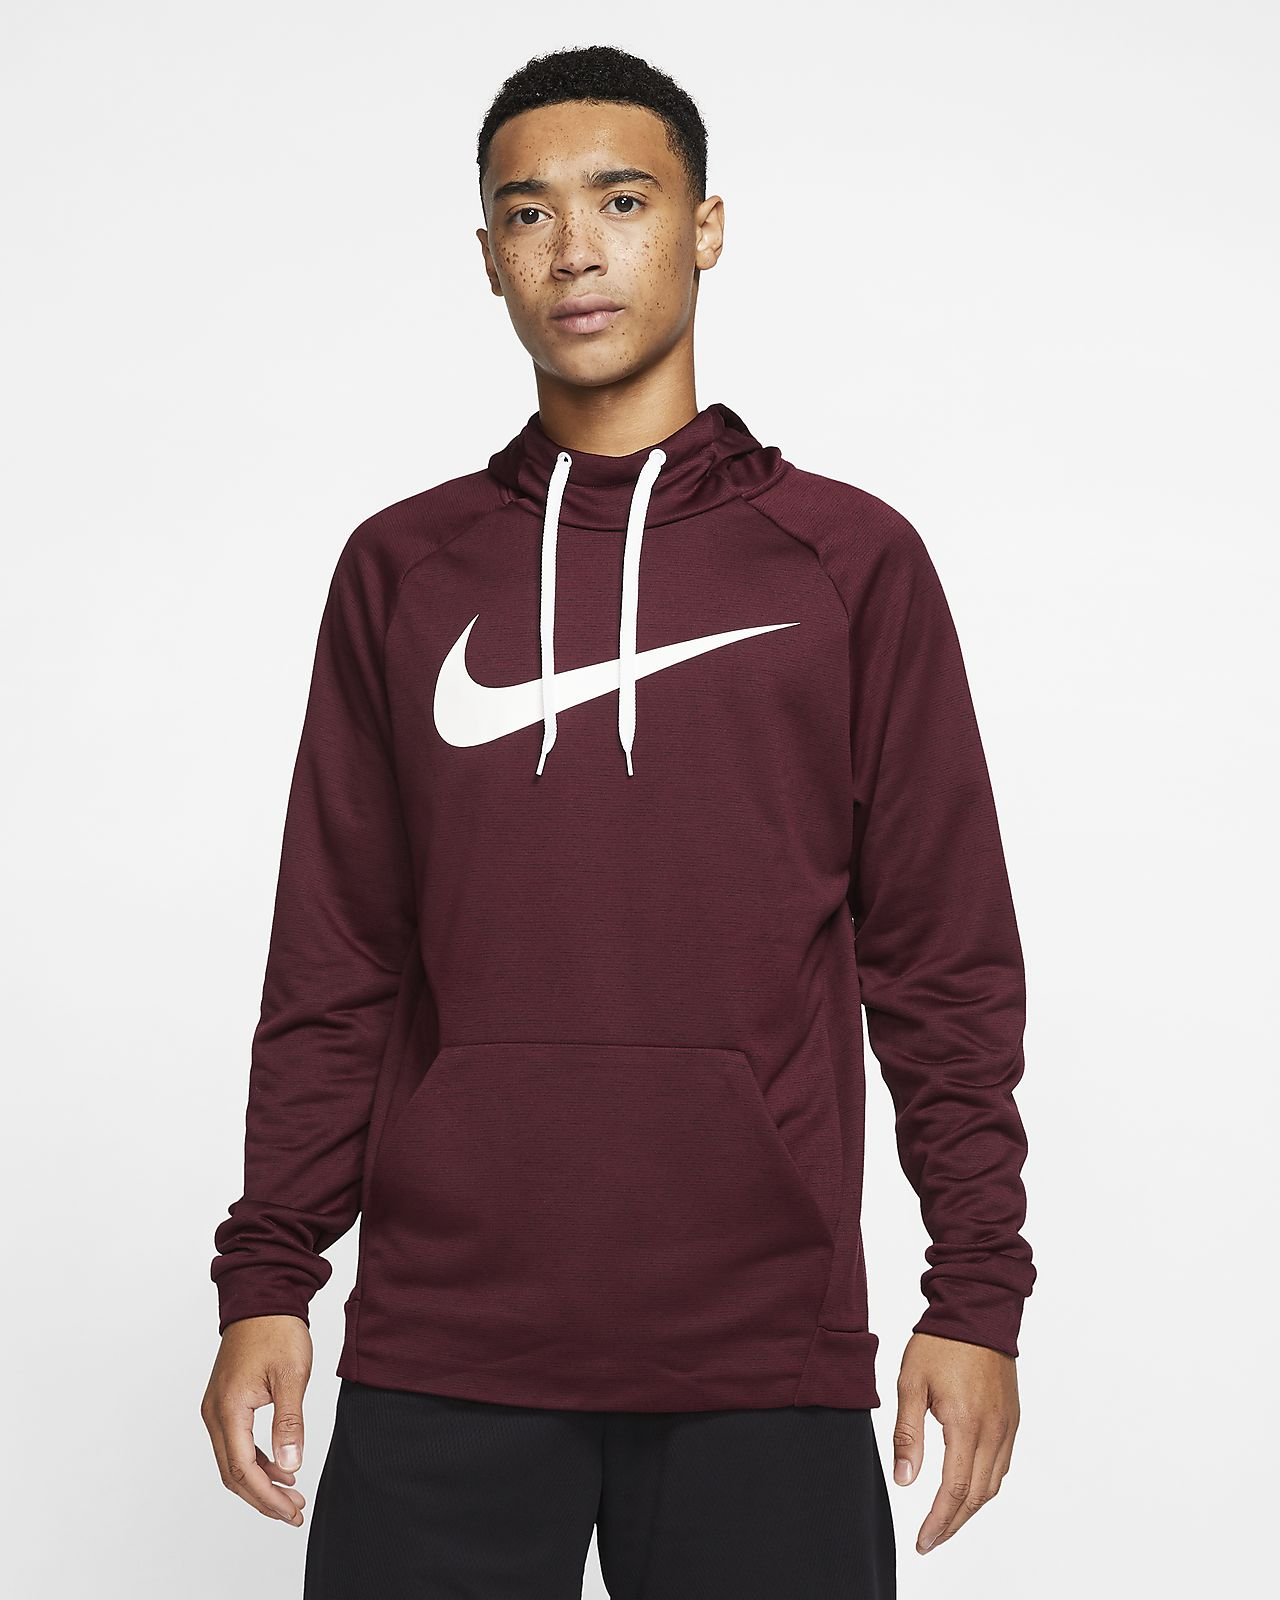 Hoodie de treino Nike Dri-FIT para homem